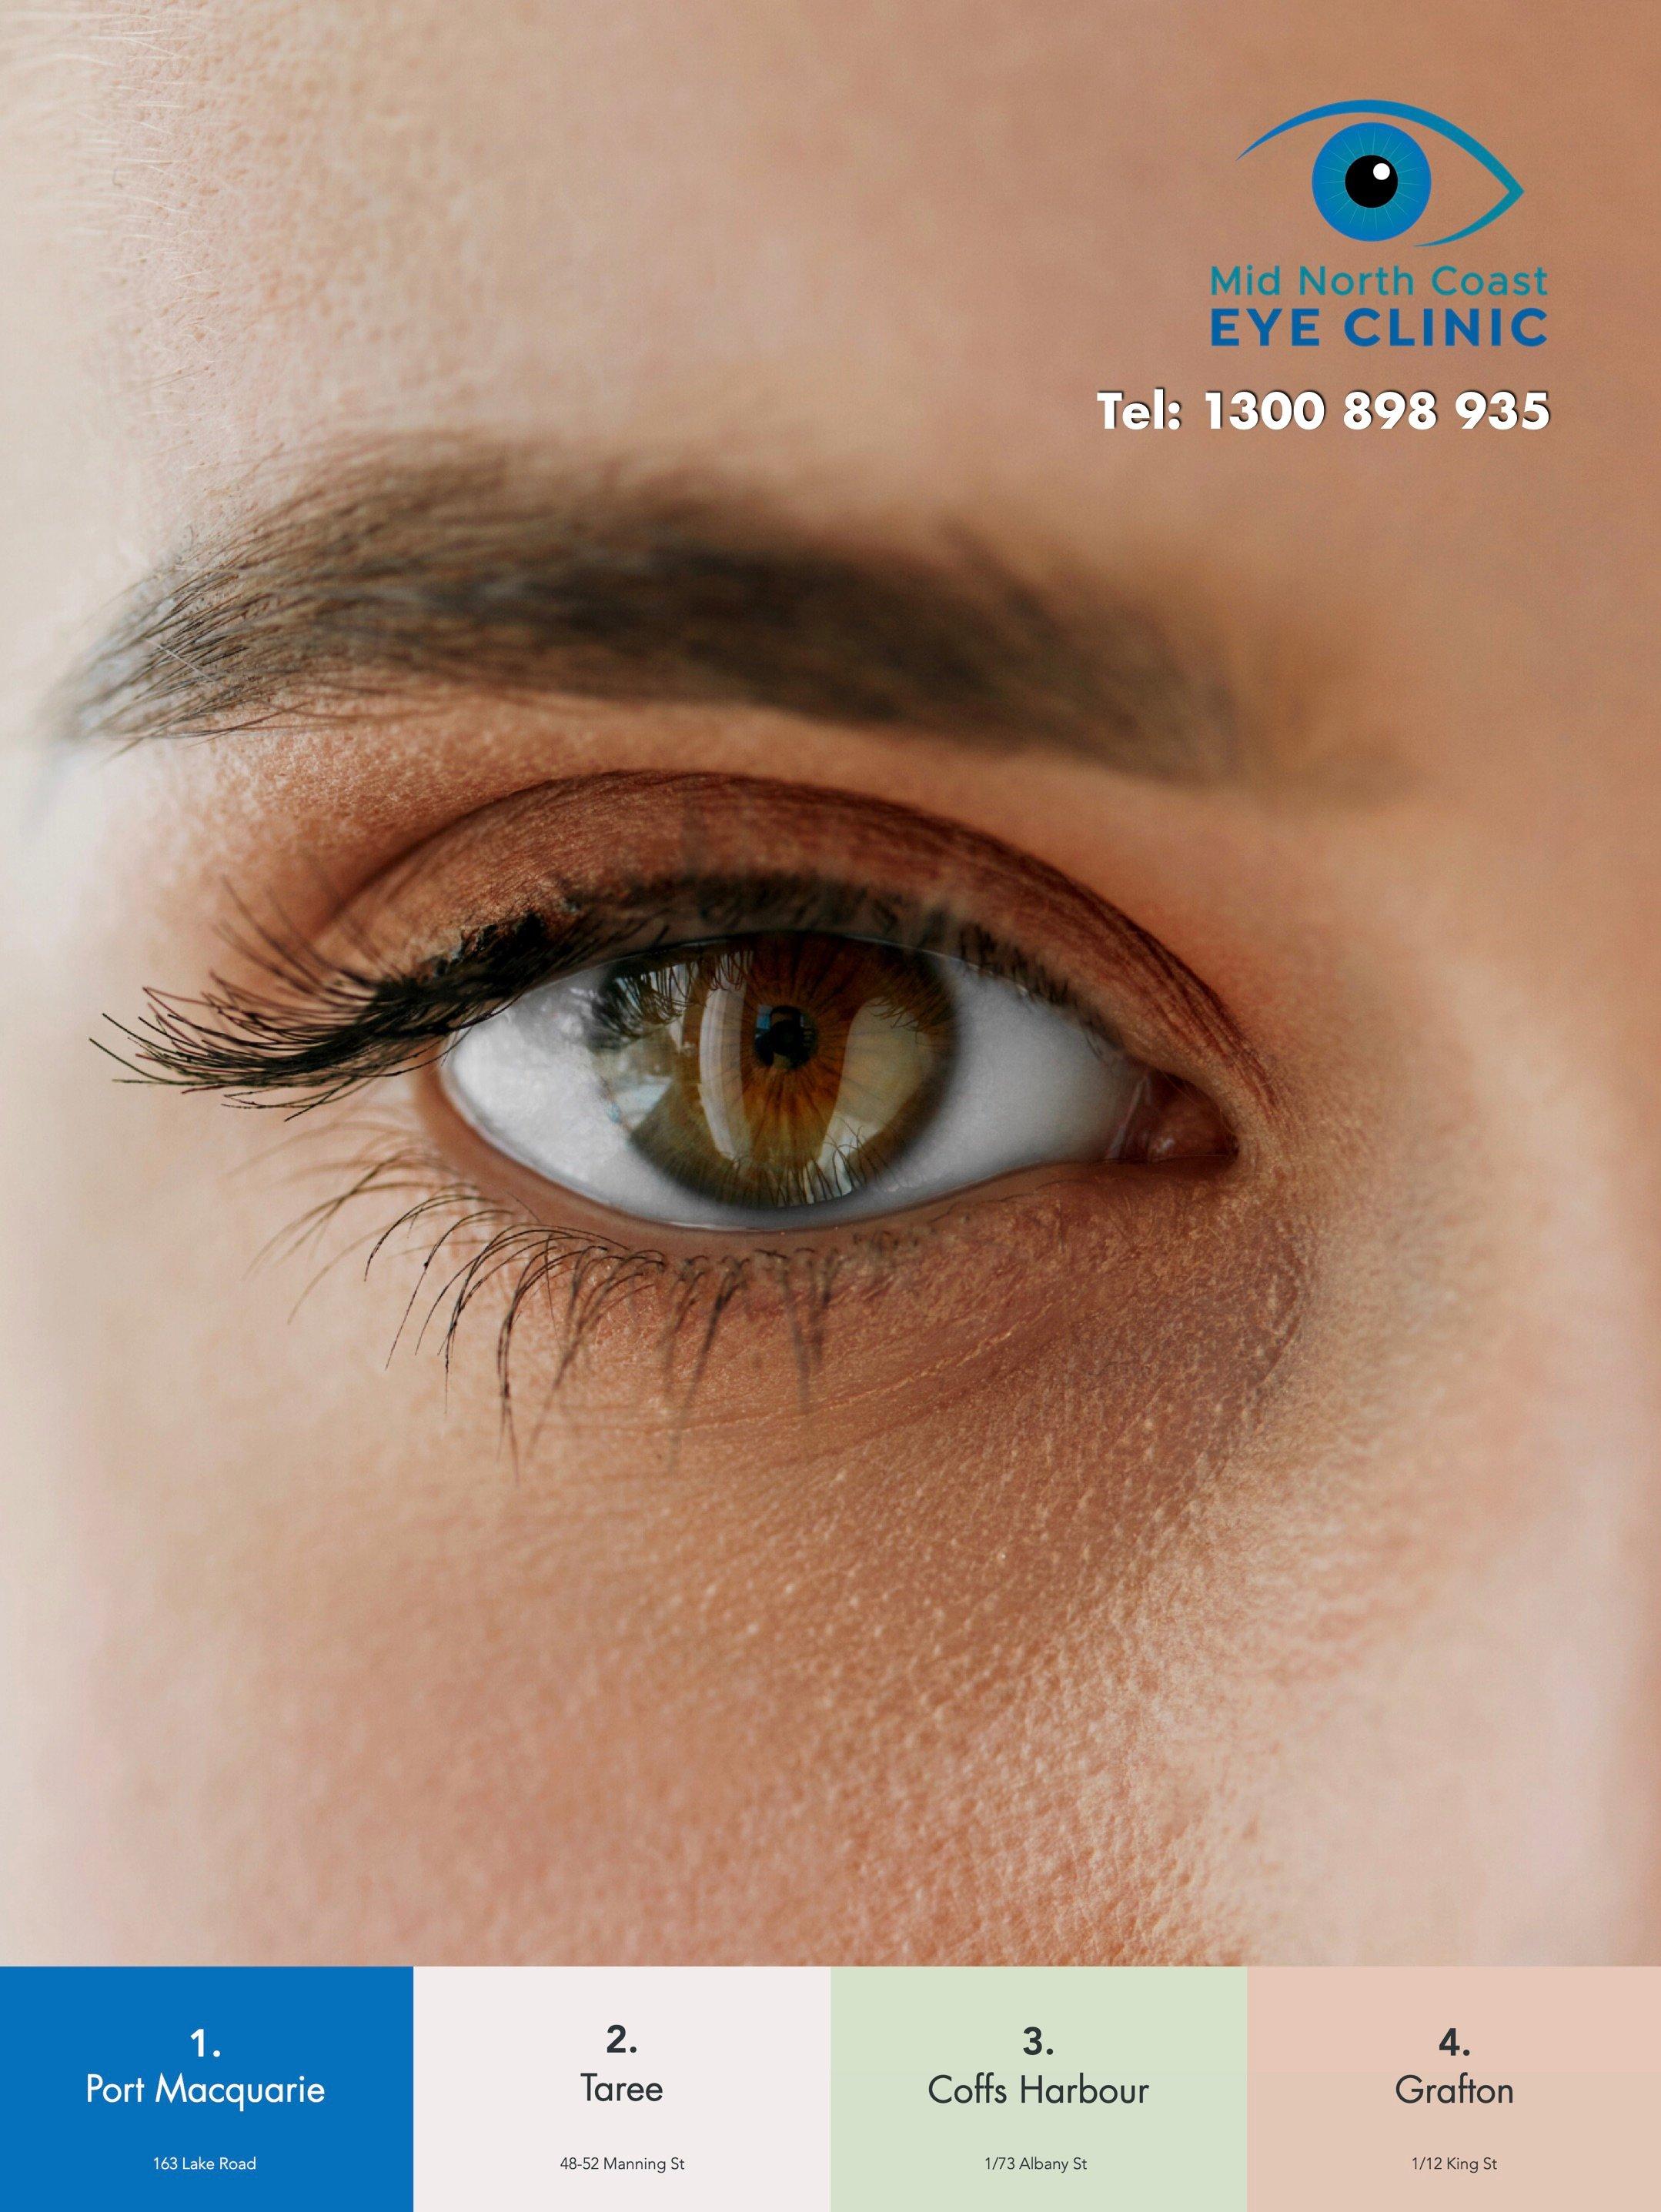 Mid North Coast Eye Clinic information brochure